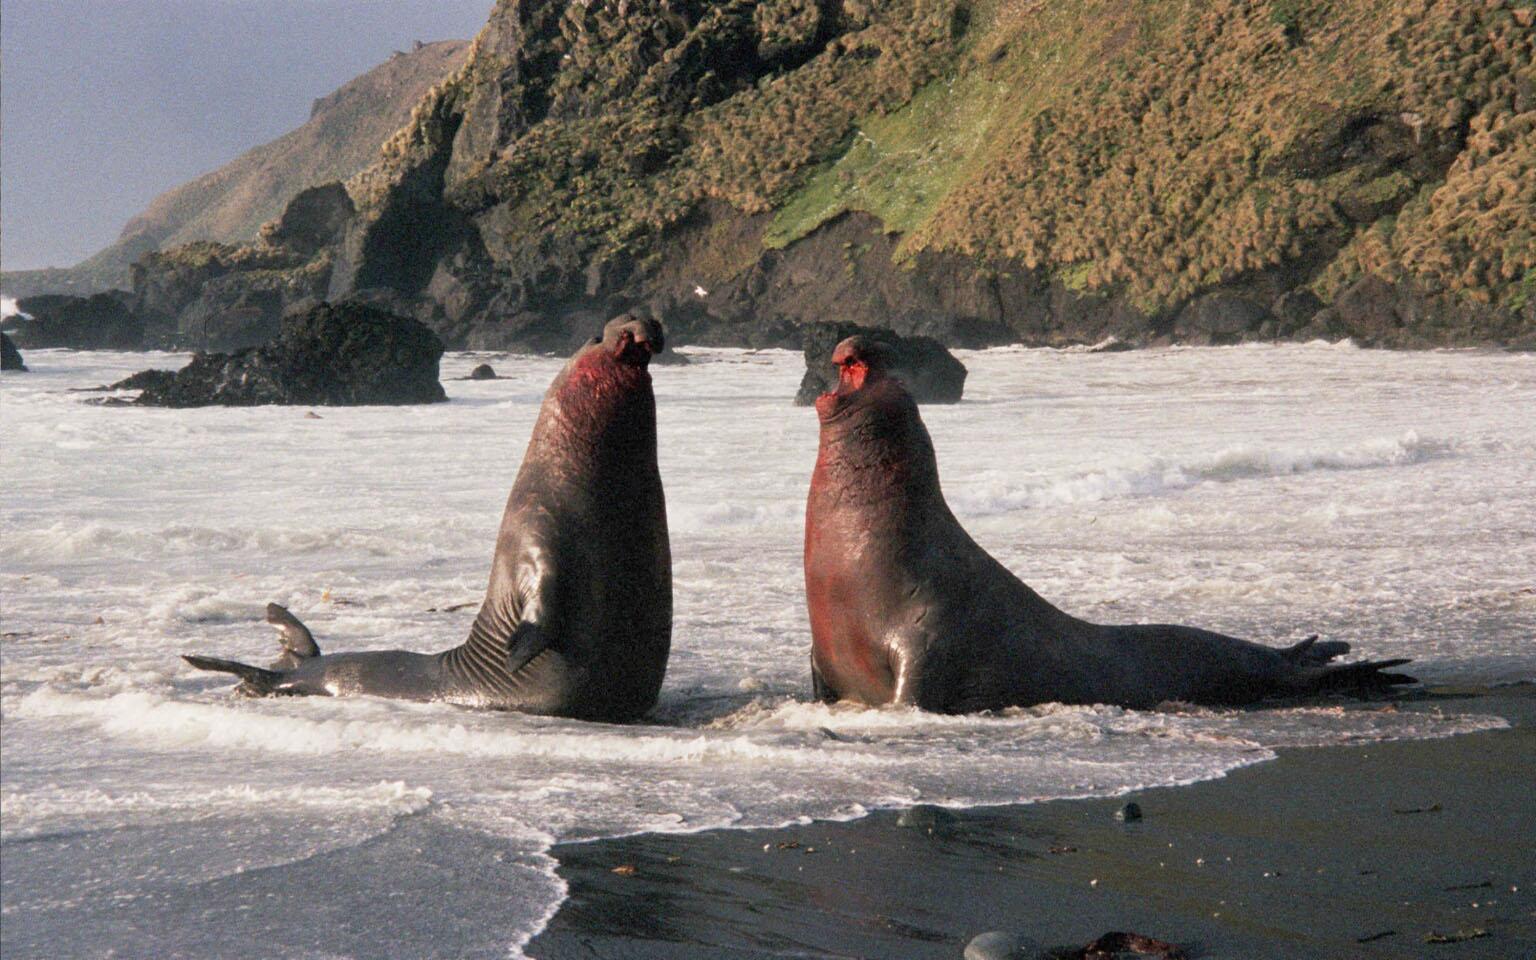 australisch-neuseeländische subantarktische Inseln (Macquarieinsel, Snares Inseln, Campbell Insel, Auckland Inseln)